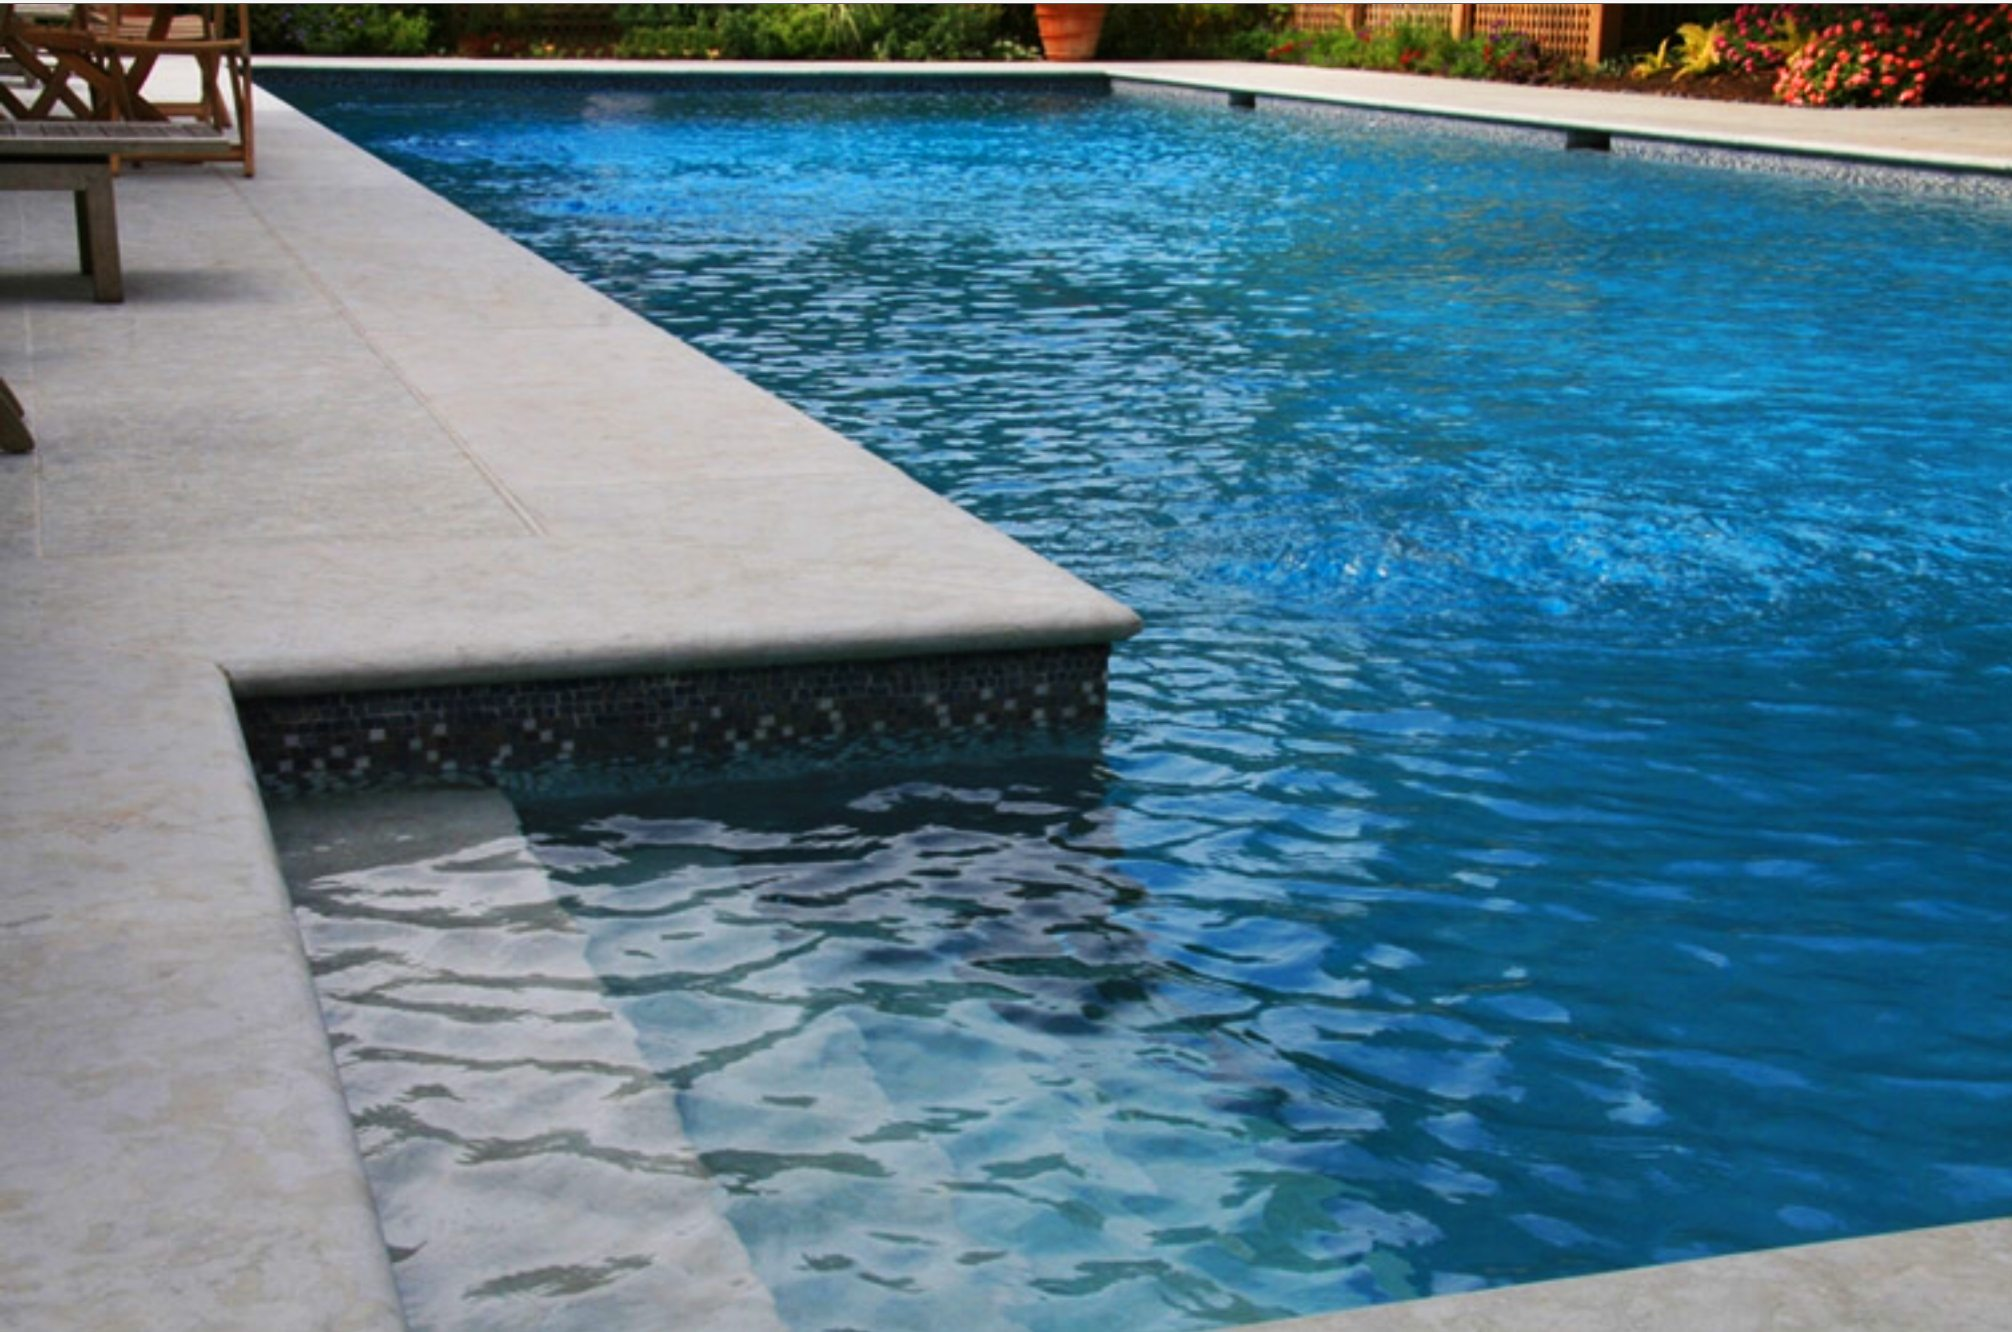 Honed Surface Bullnose Edge Beige Travertine Swimming Pool: Travertine Sydney Supplying